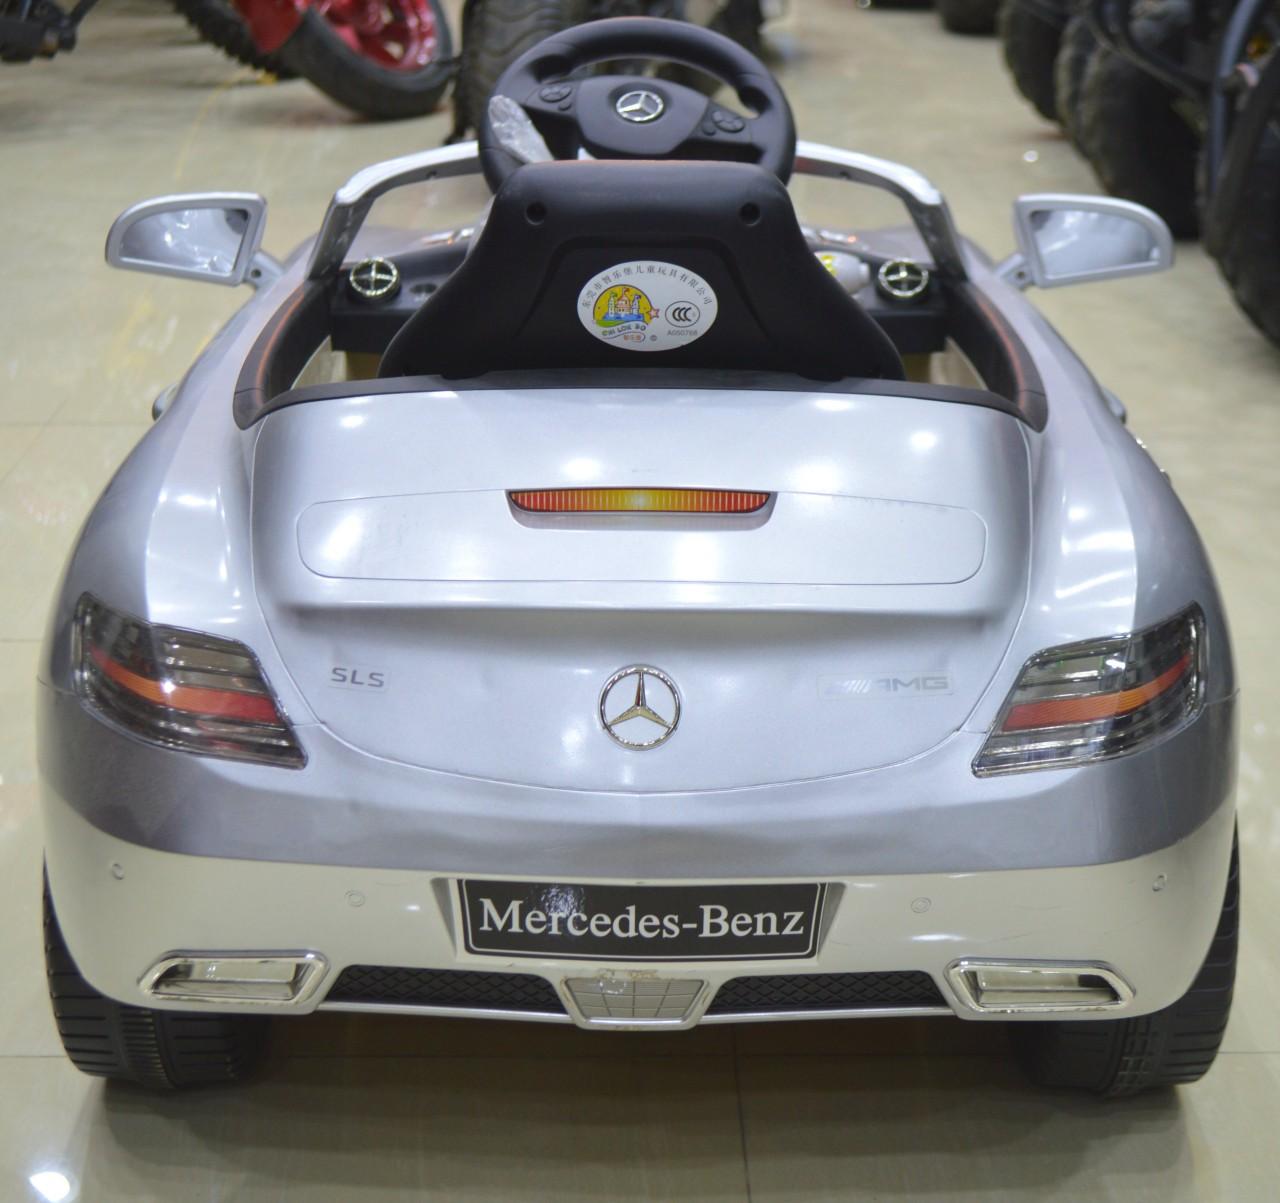 Kids Electric Smart Car Mercedes Benz Model No 681 Price